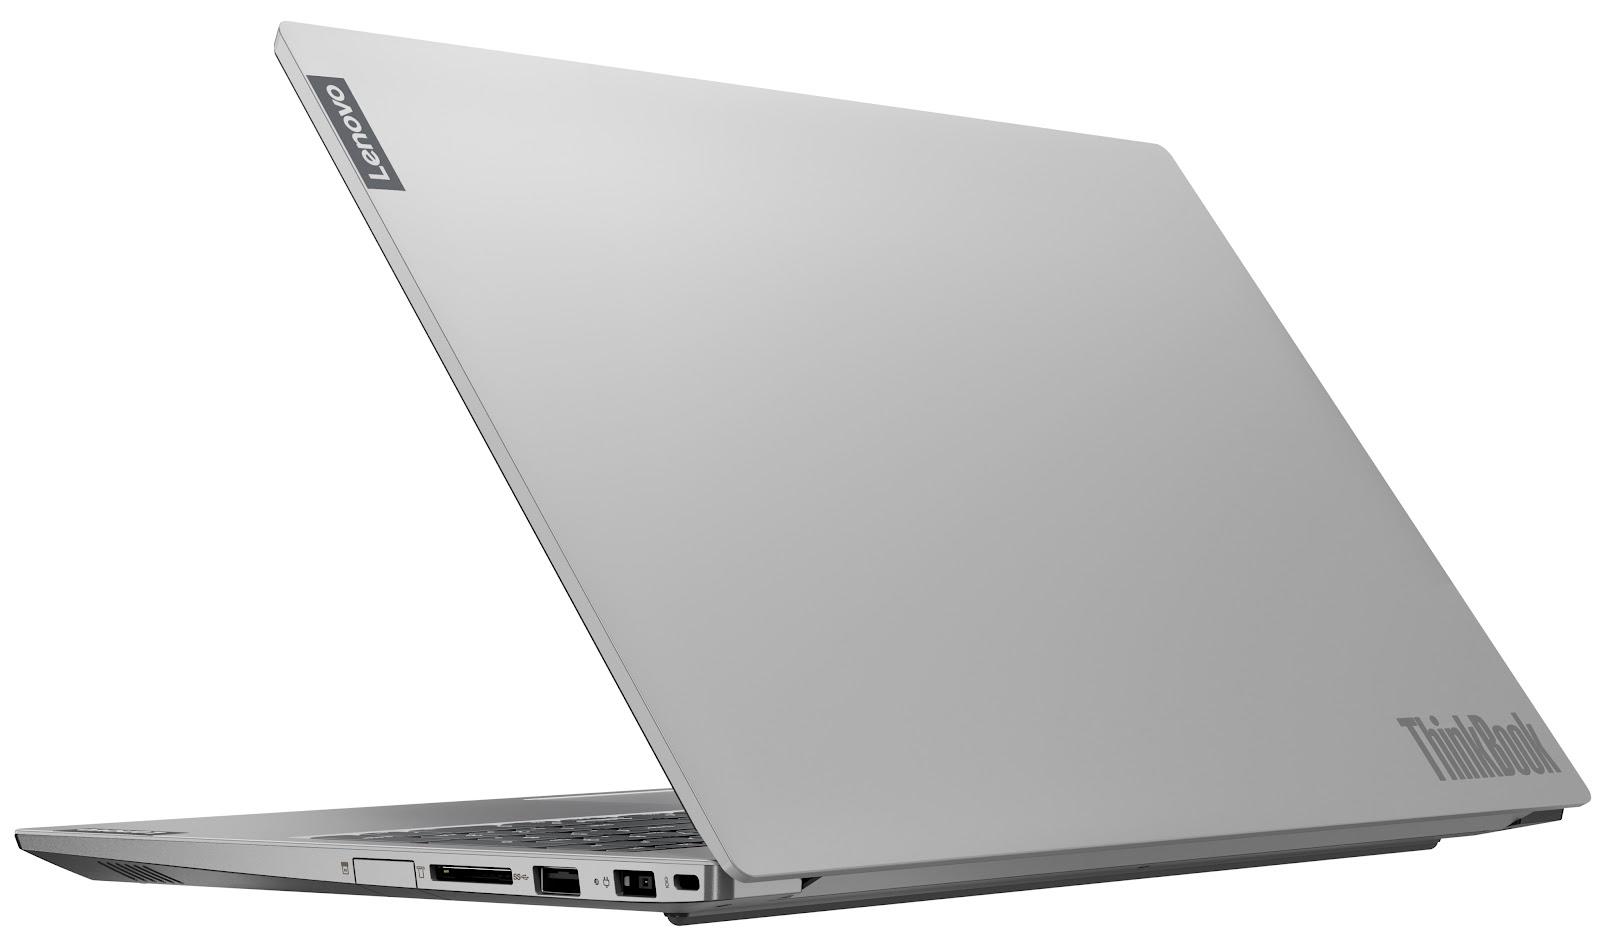 Фото 1. Ноутбук Lenovo ThinkBook 15-IIL (20SM000FRU)